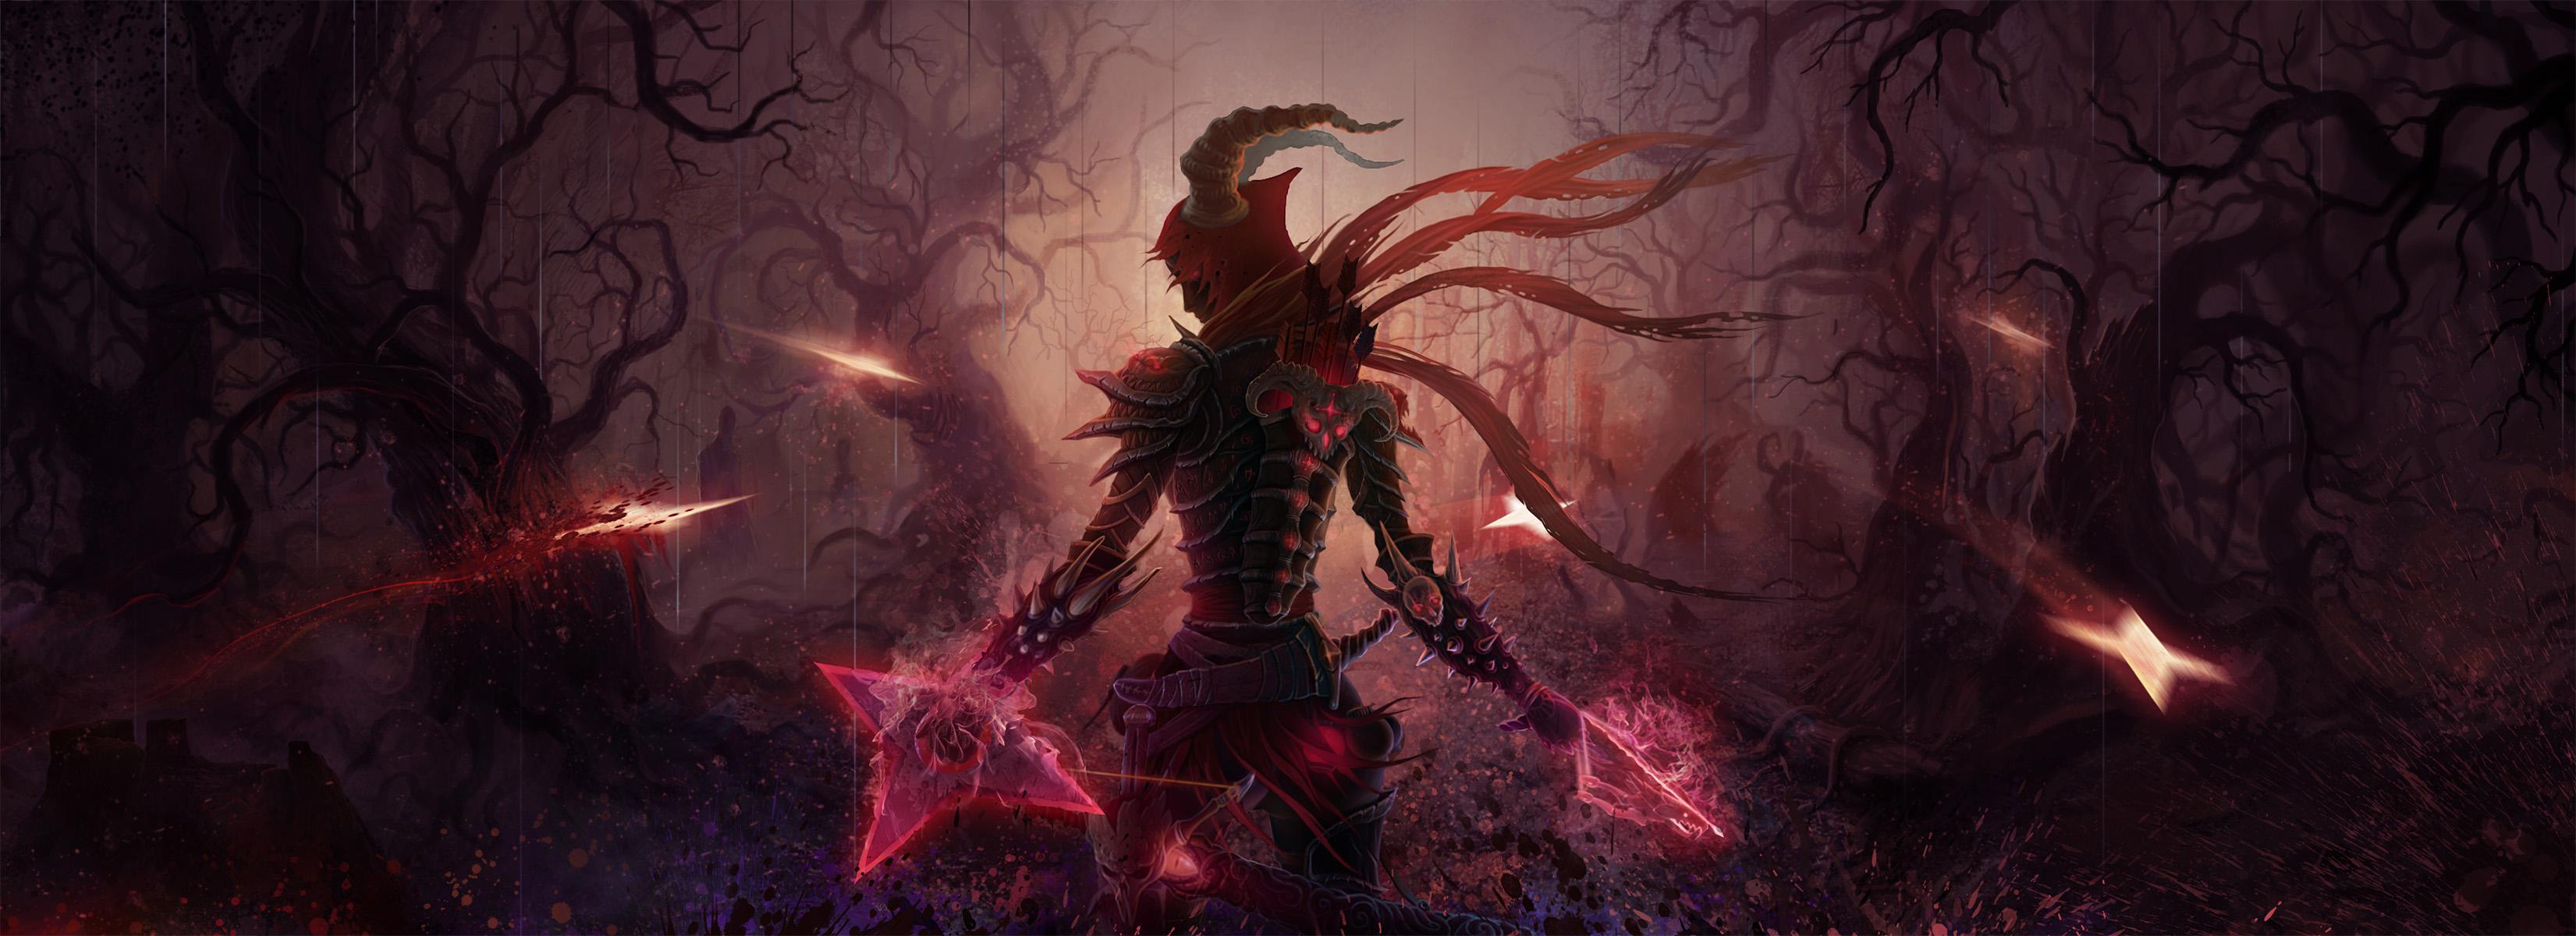 Diablo Iii Hd Wallpaper Background Image 3302x1200 Id 338688